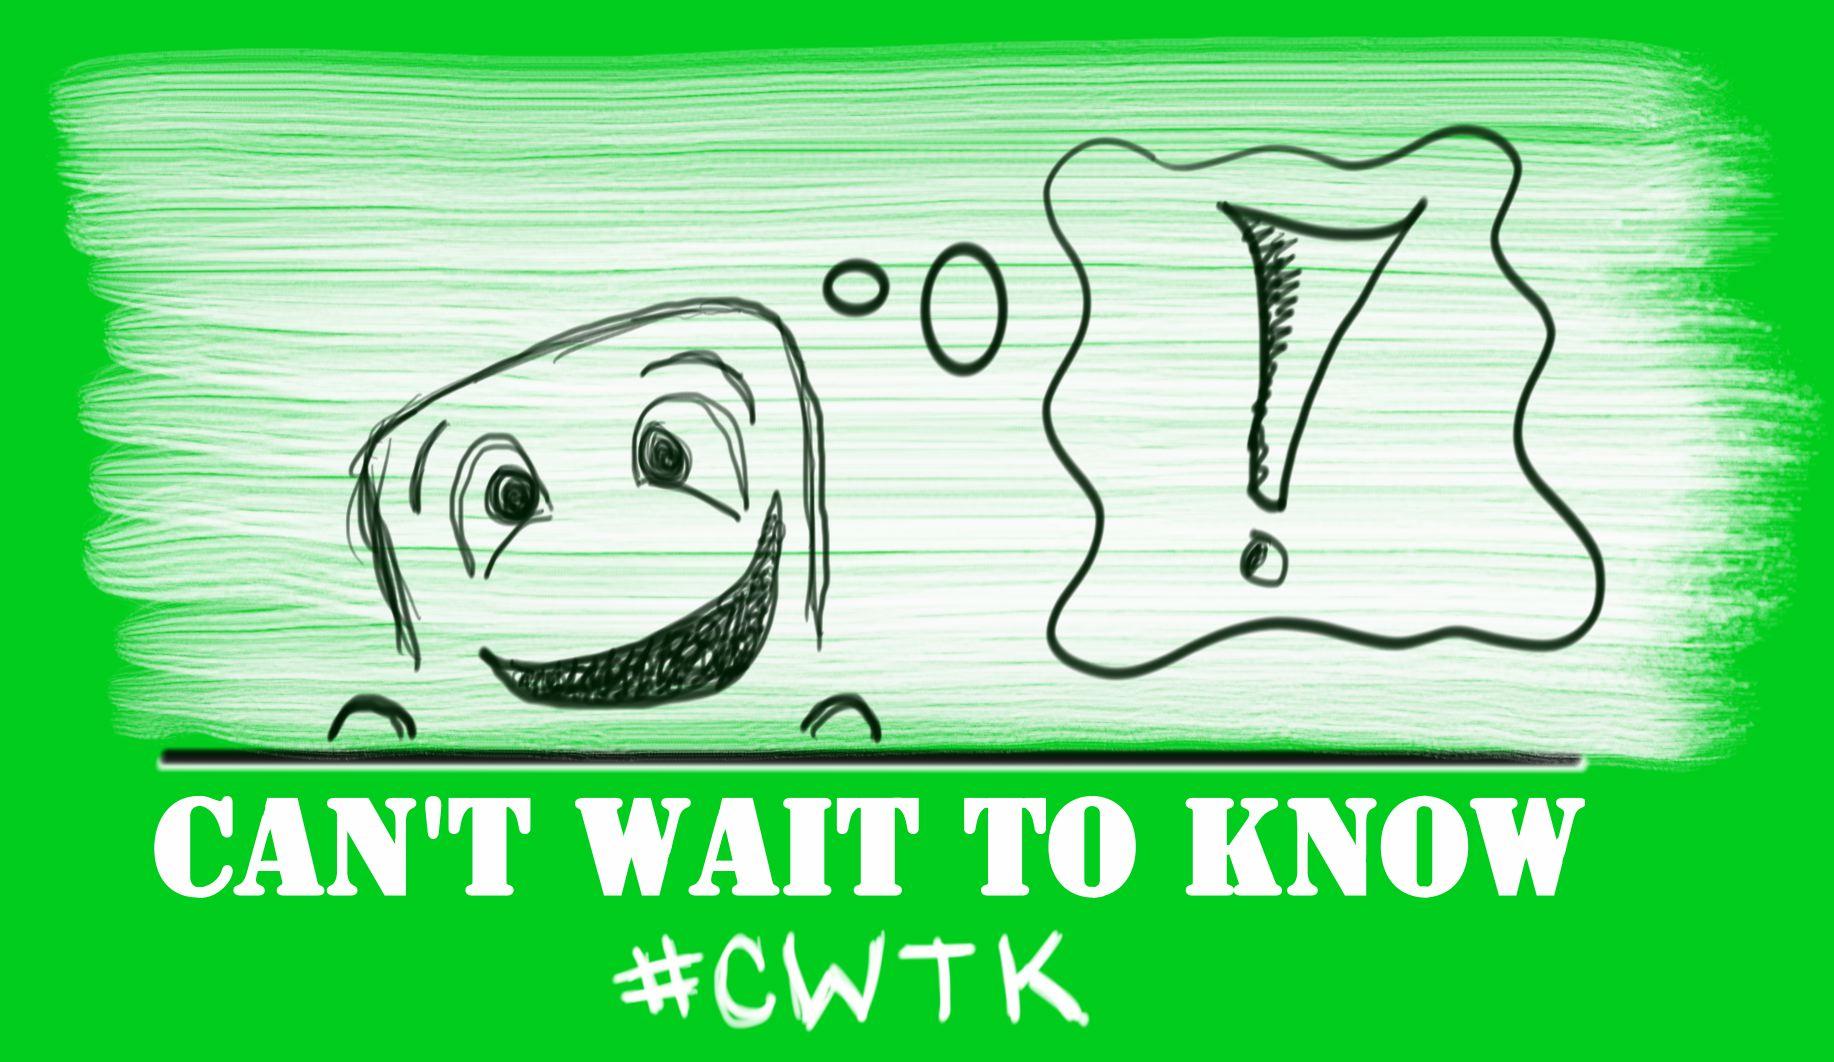 CWTKLogoGreen.jpg